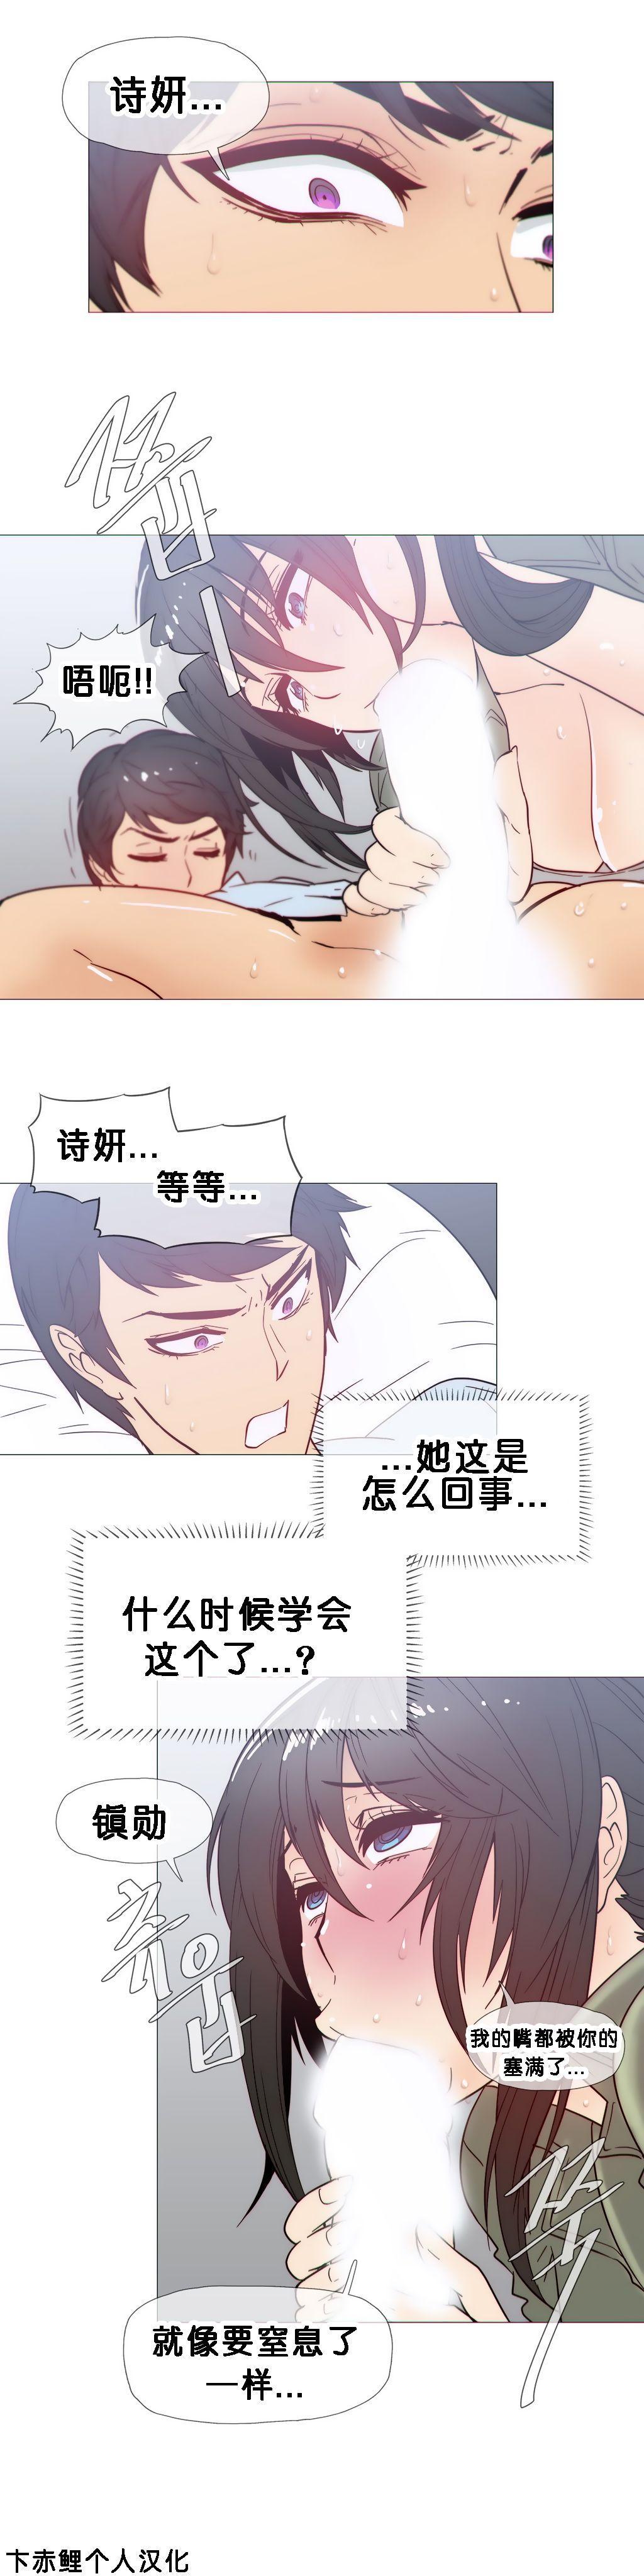 HouseHold Affairs 【卞赤鲤个人汉化】1~33话(持续更新中) 513